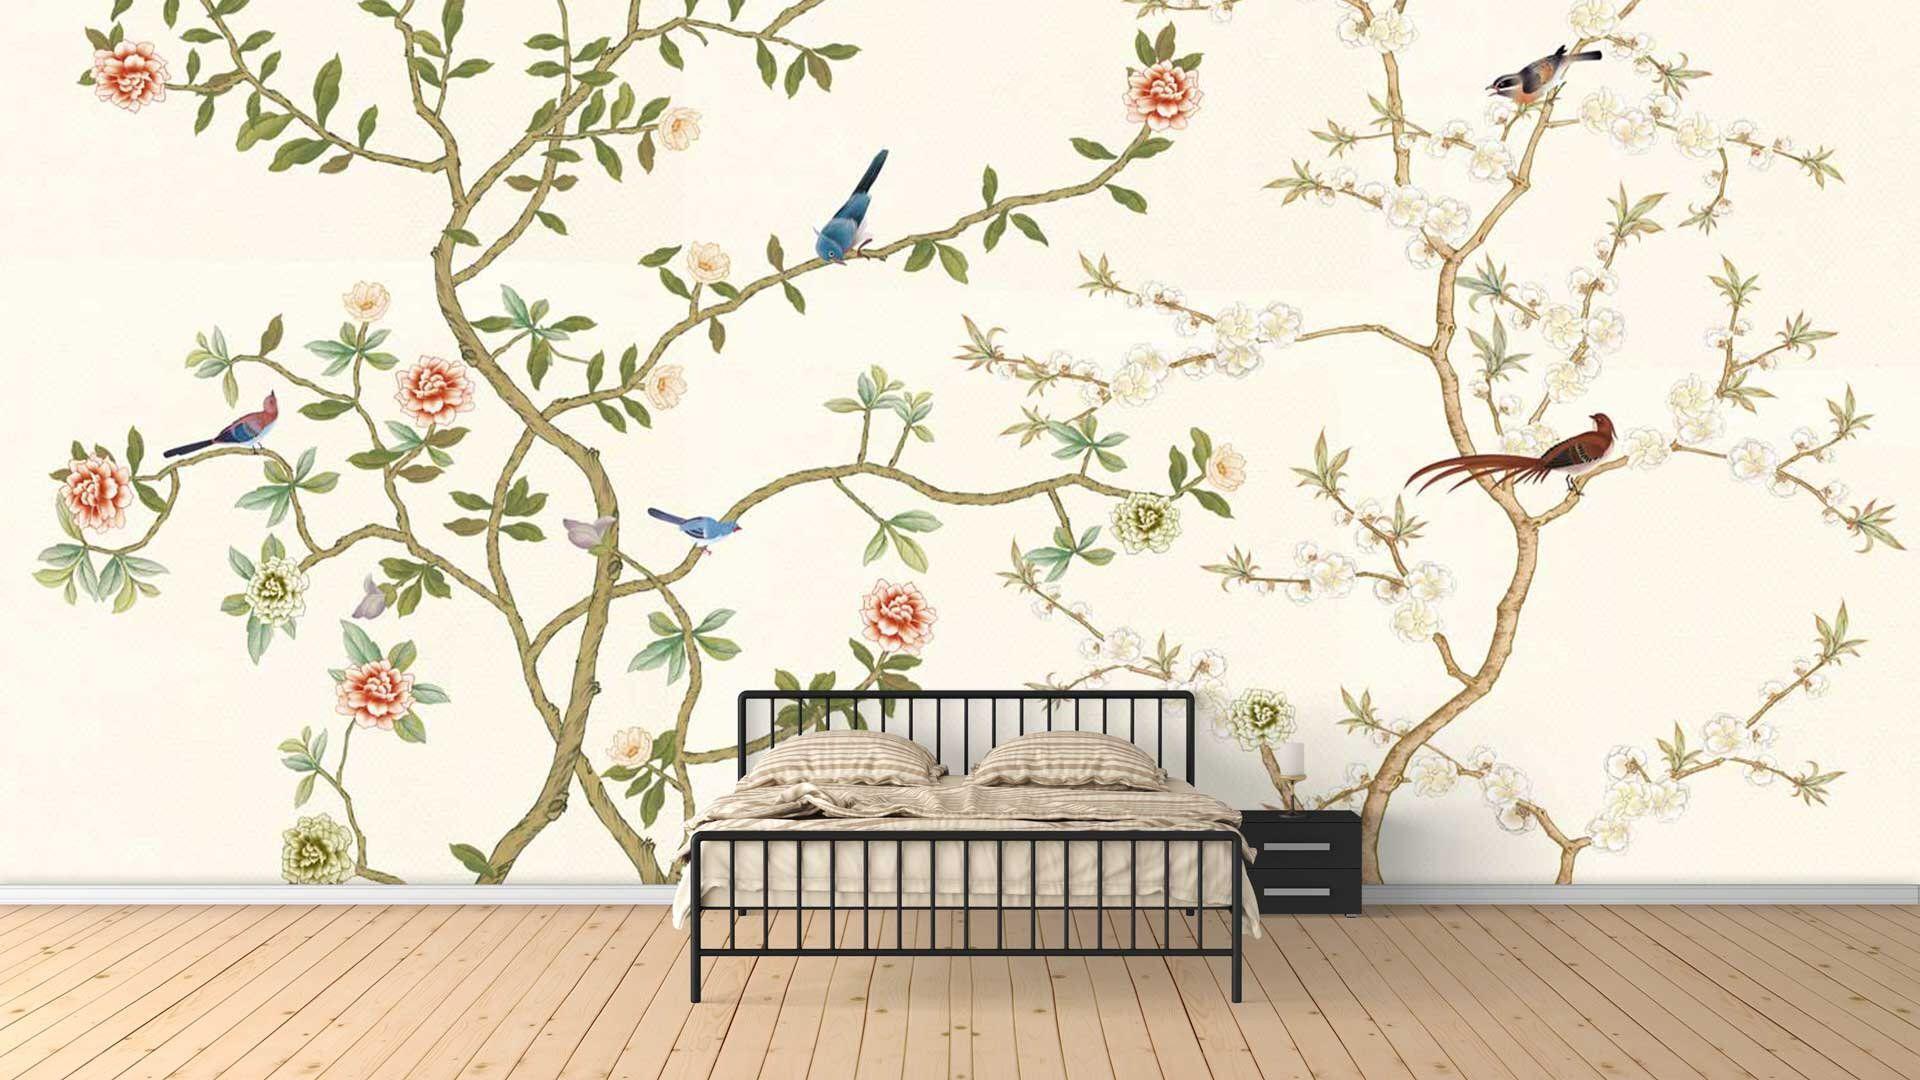 Nauzha Chinoiserie Wallpaper Vintage Bird Wallpaper Chinoiserie Removable Wallpaper Chinoiserie Mural Sample Wp042 Chinoiserie Wallpaper Vintage Bird Wallpaper Removable Wallpaper